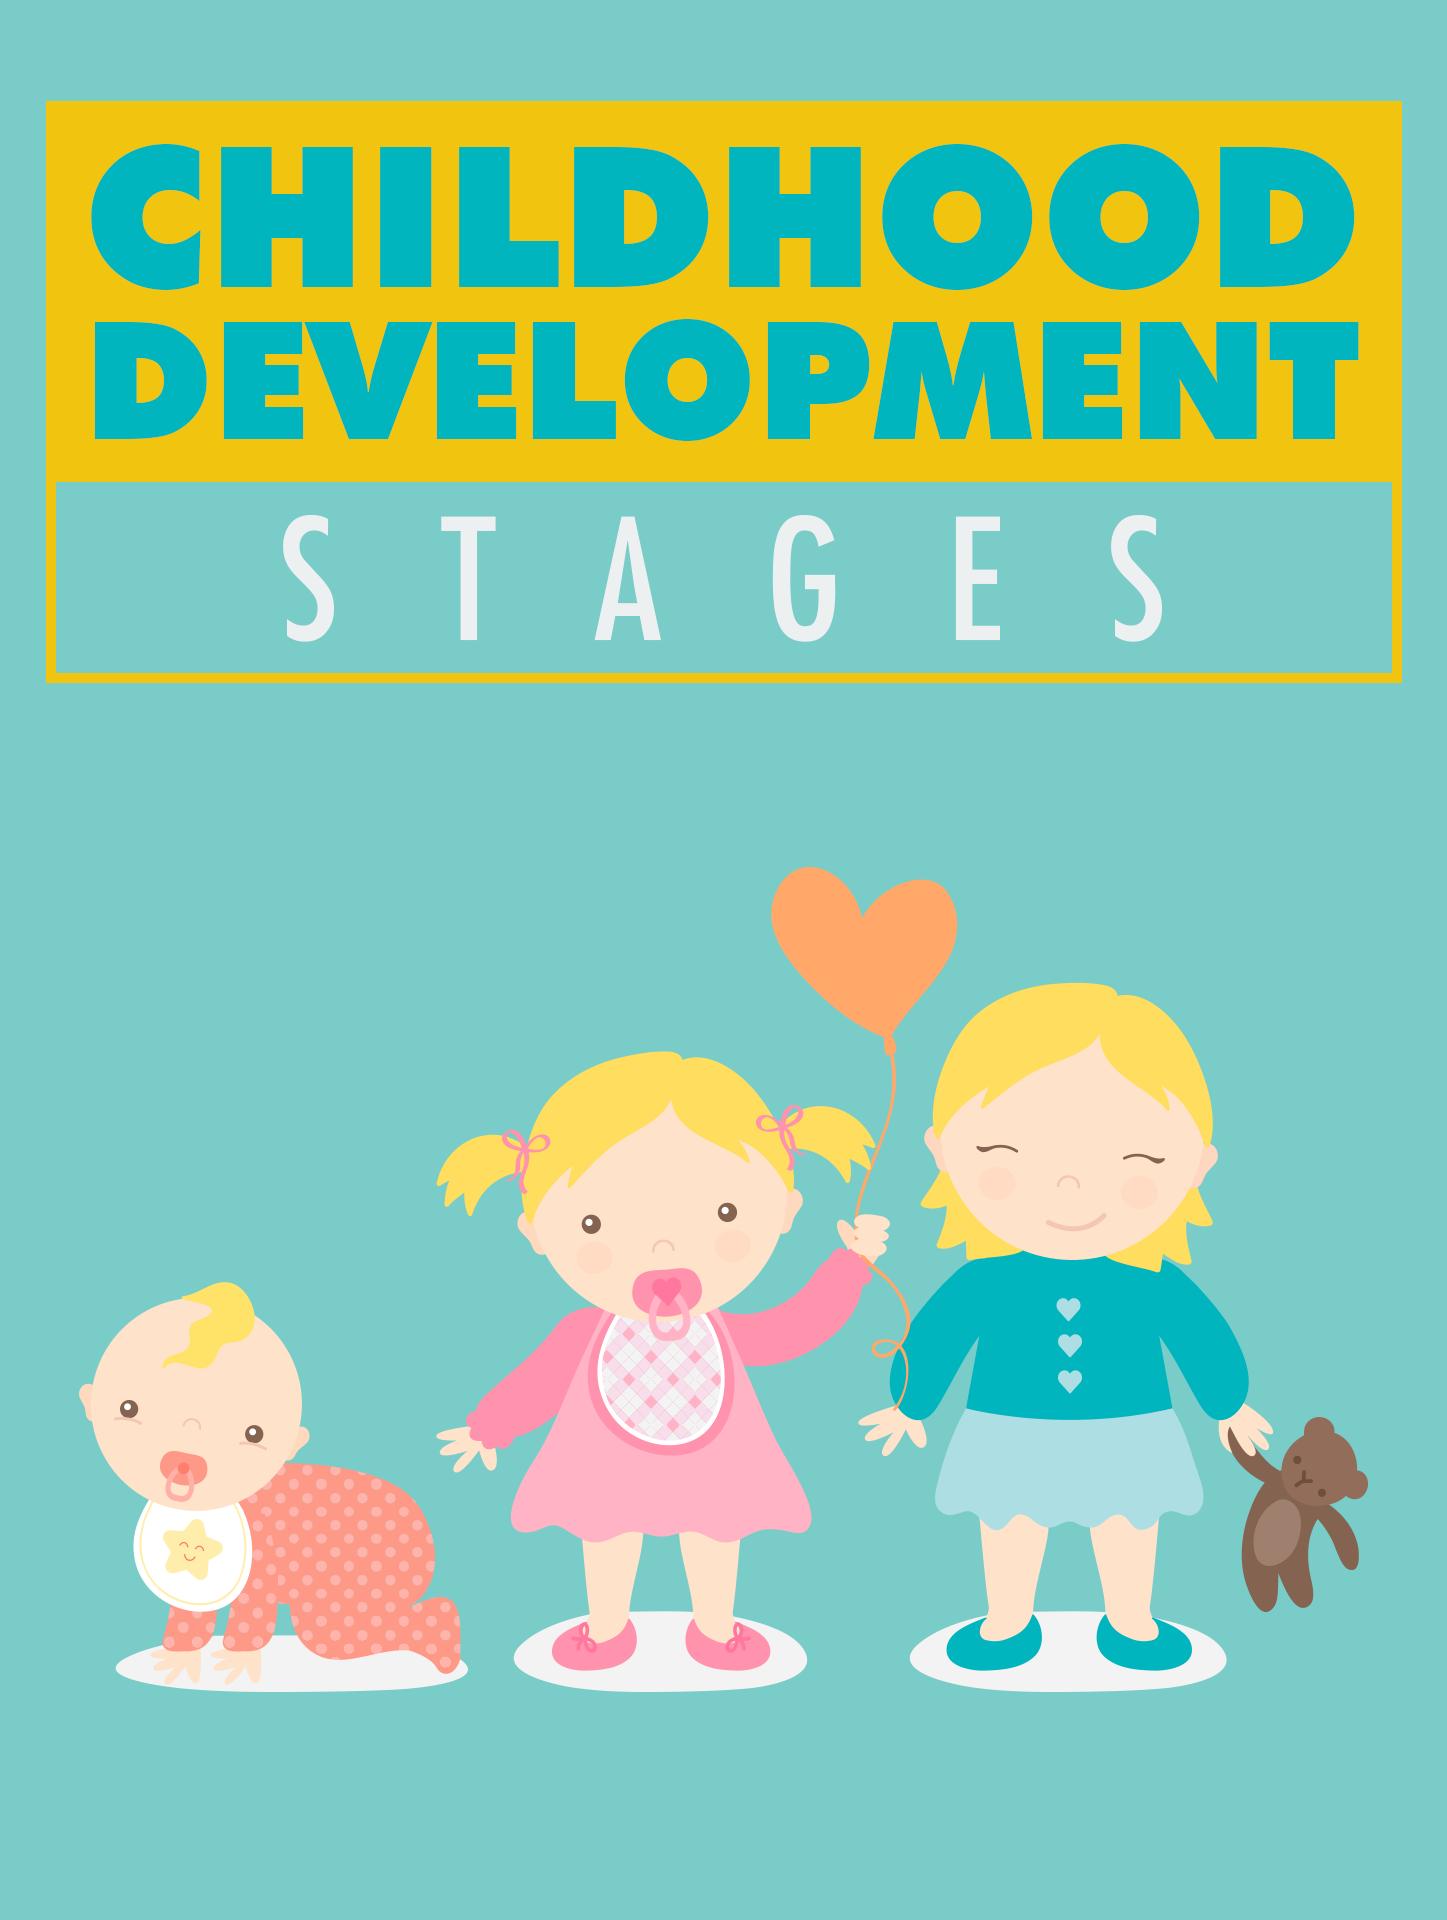 Childhood-Development-Stages